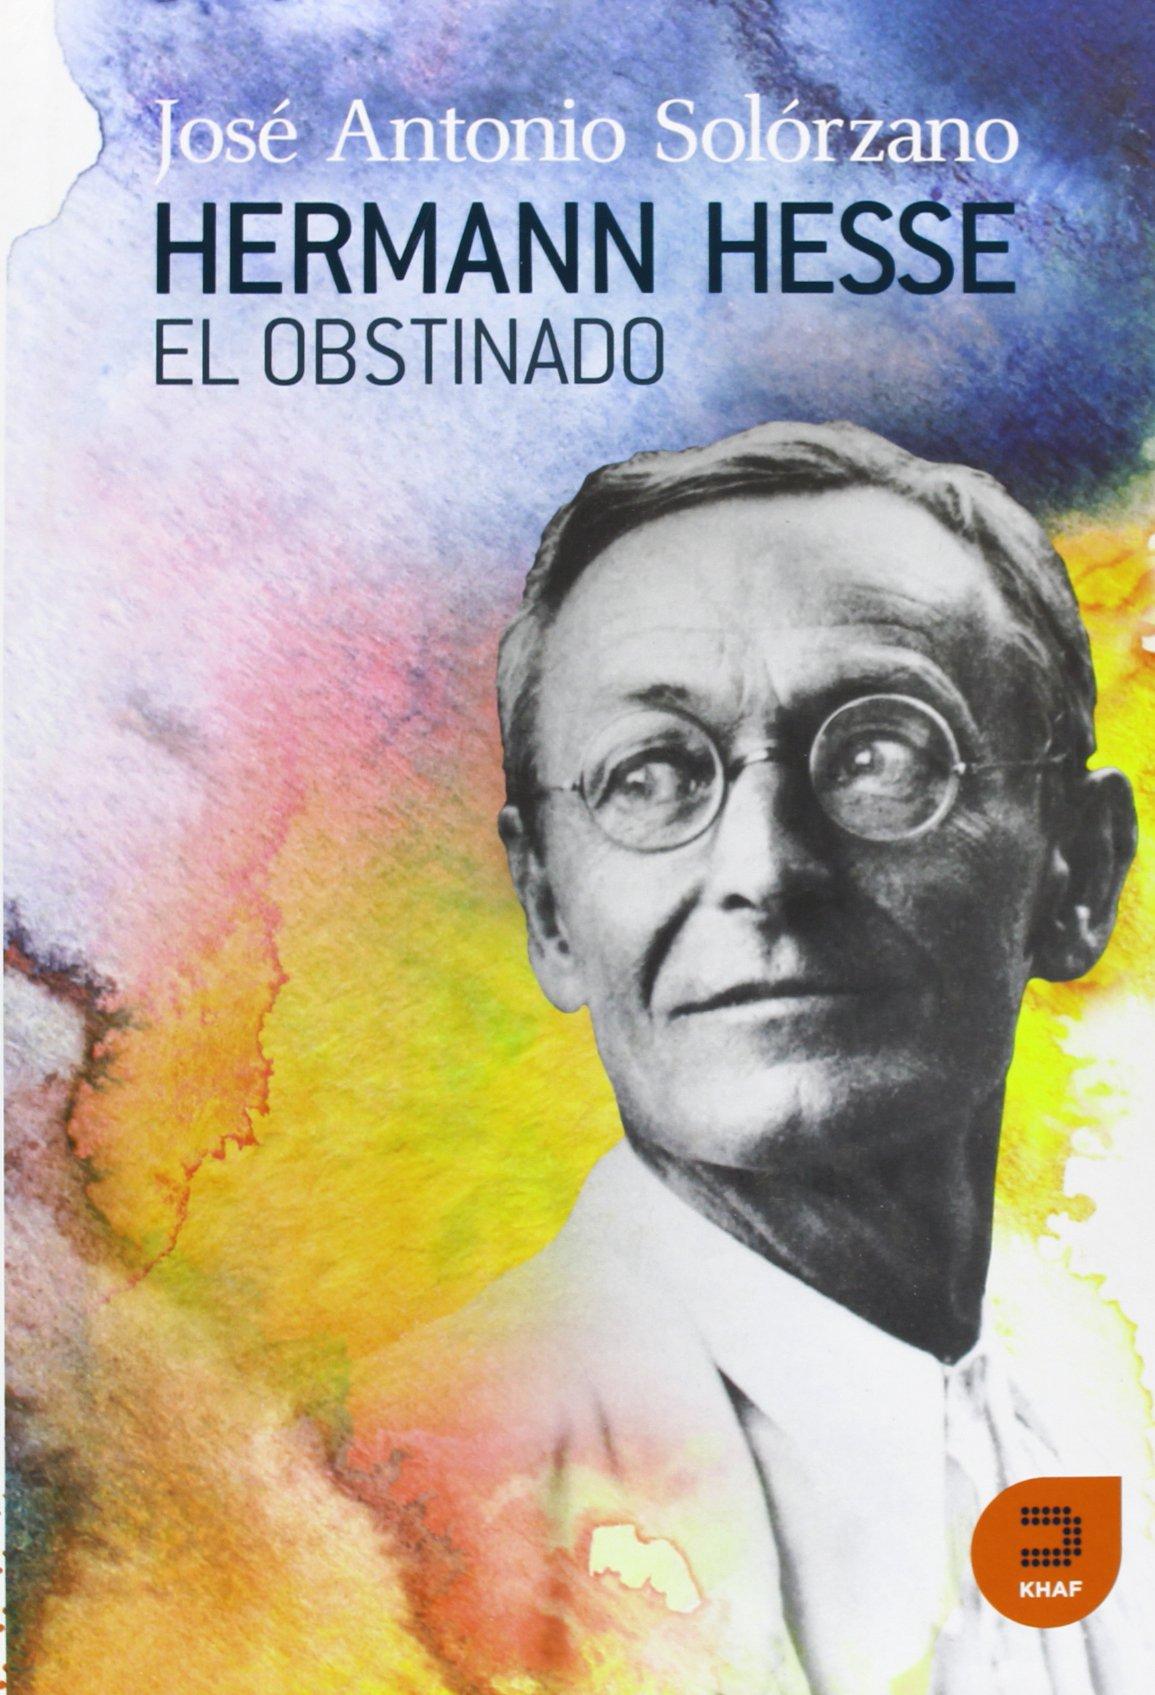 Hermann Hesse, el obstinado / Hermann Hesse, obstinate ...